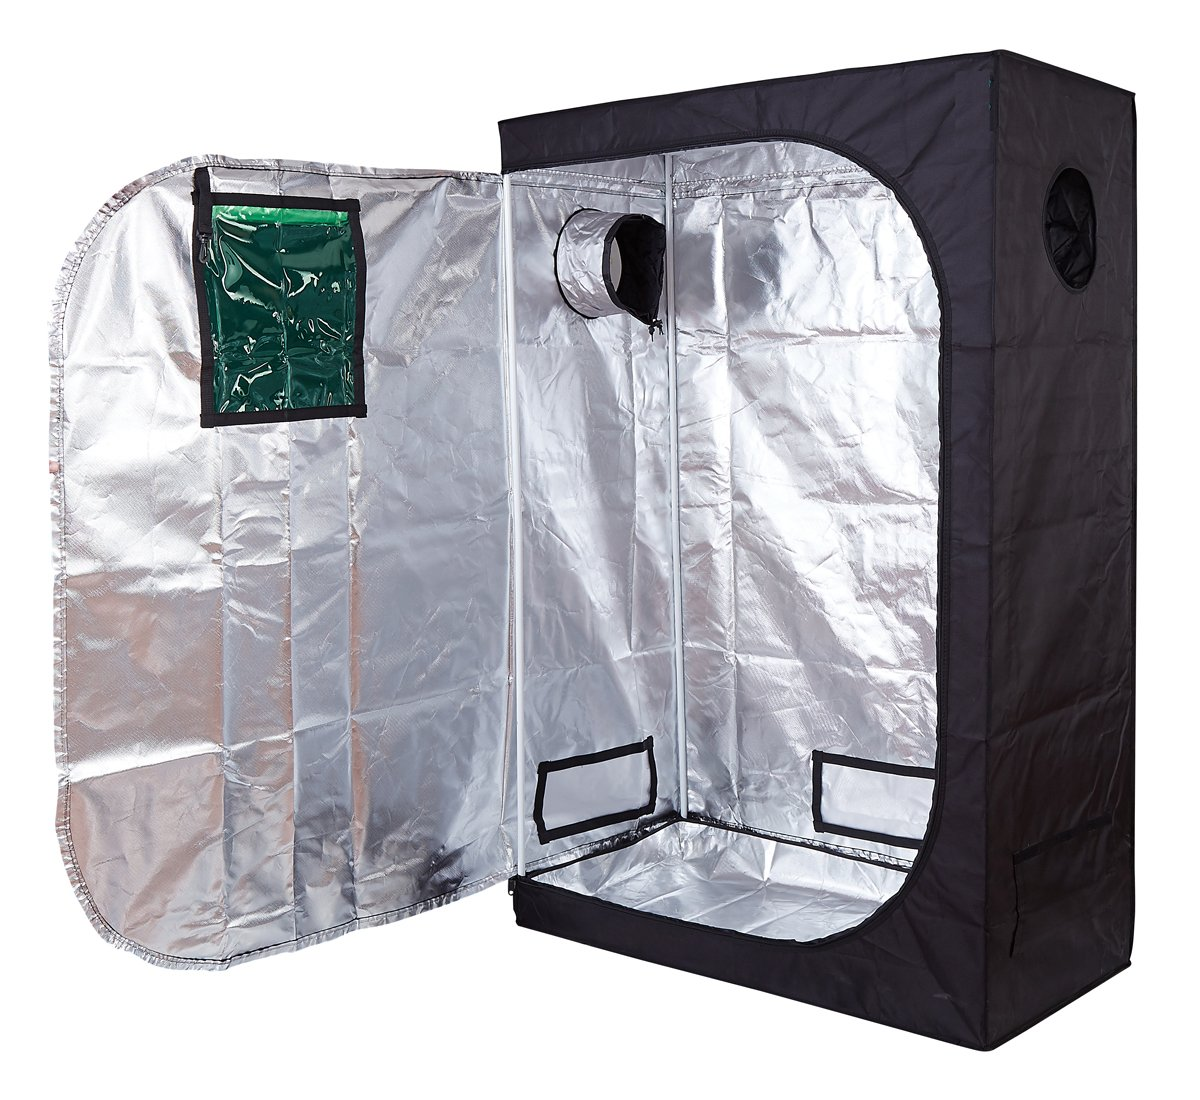 Hydro Plus 48''x24''x72'' Grow Tent Reflective Mylar Hydroponics Indoor Plant Growing Dark Room w/Observation Window (48''x24''x72'' -2)